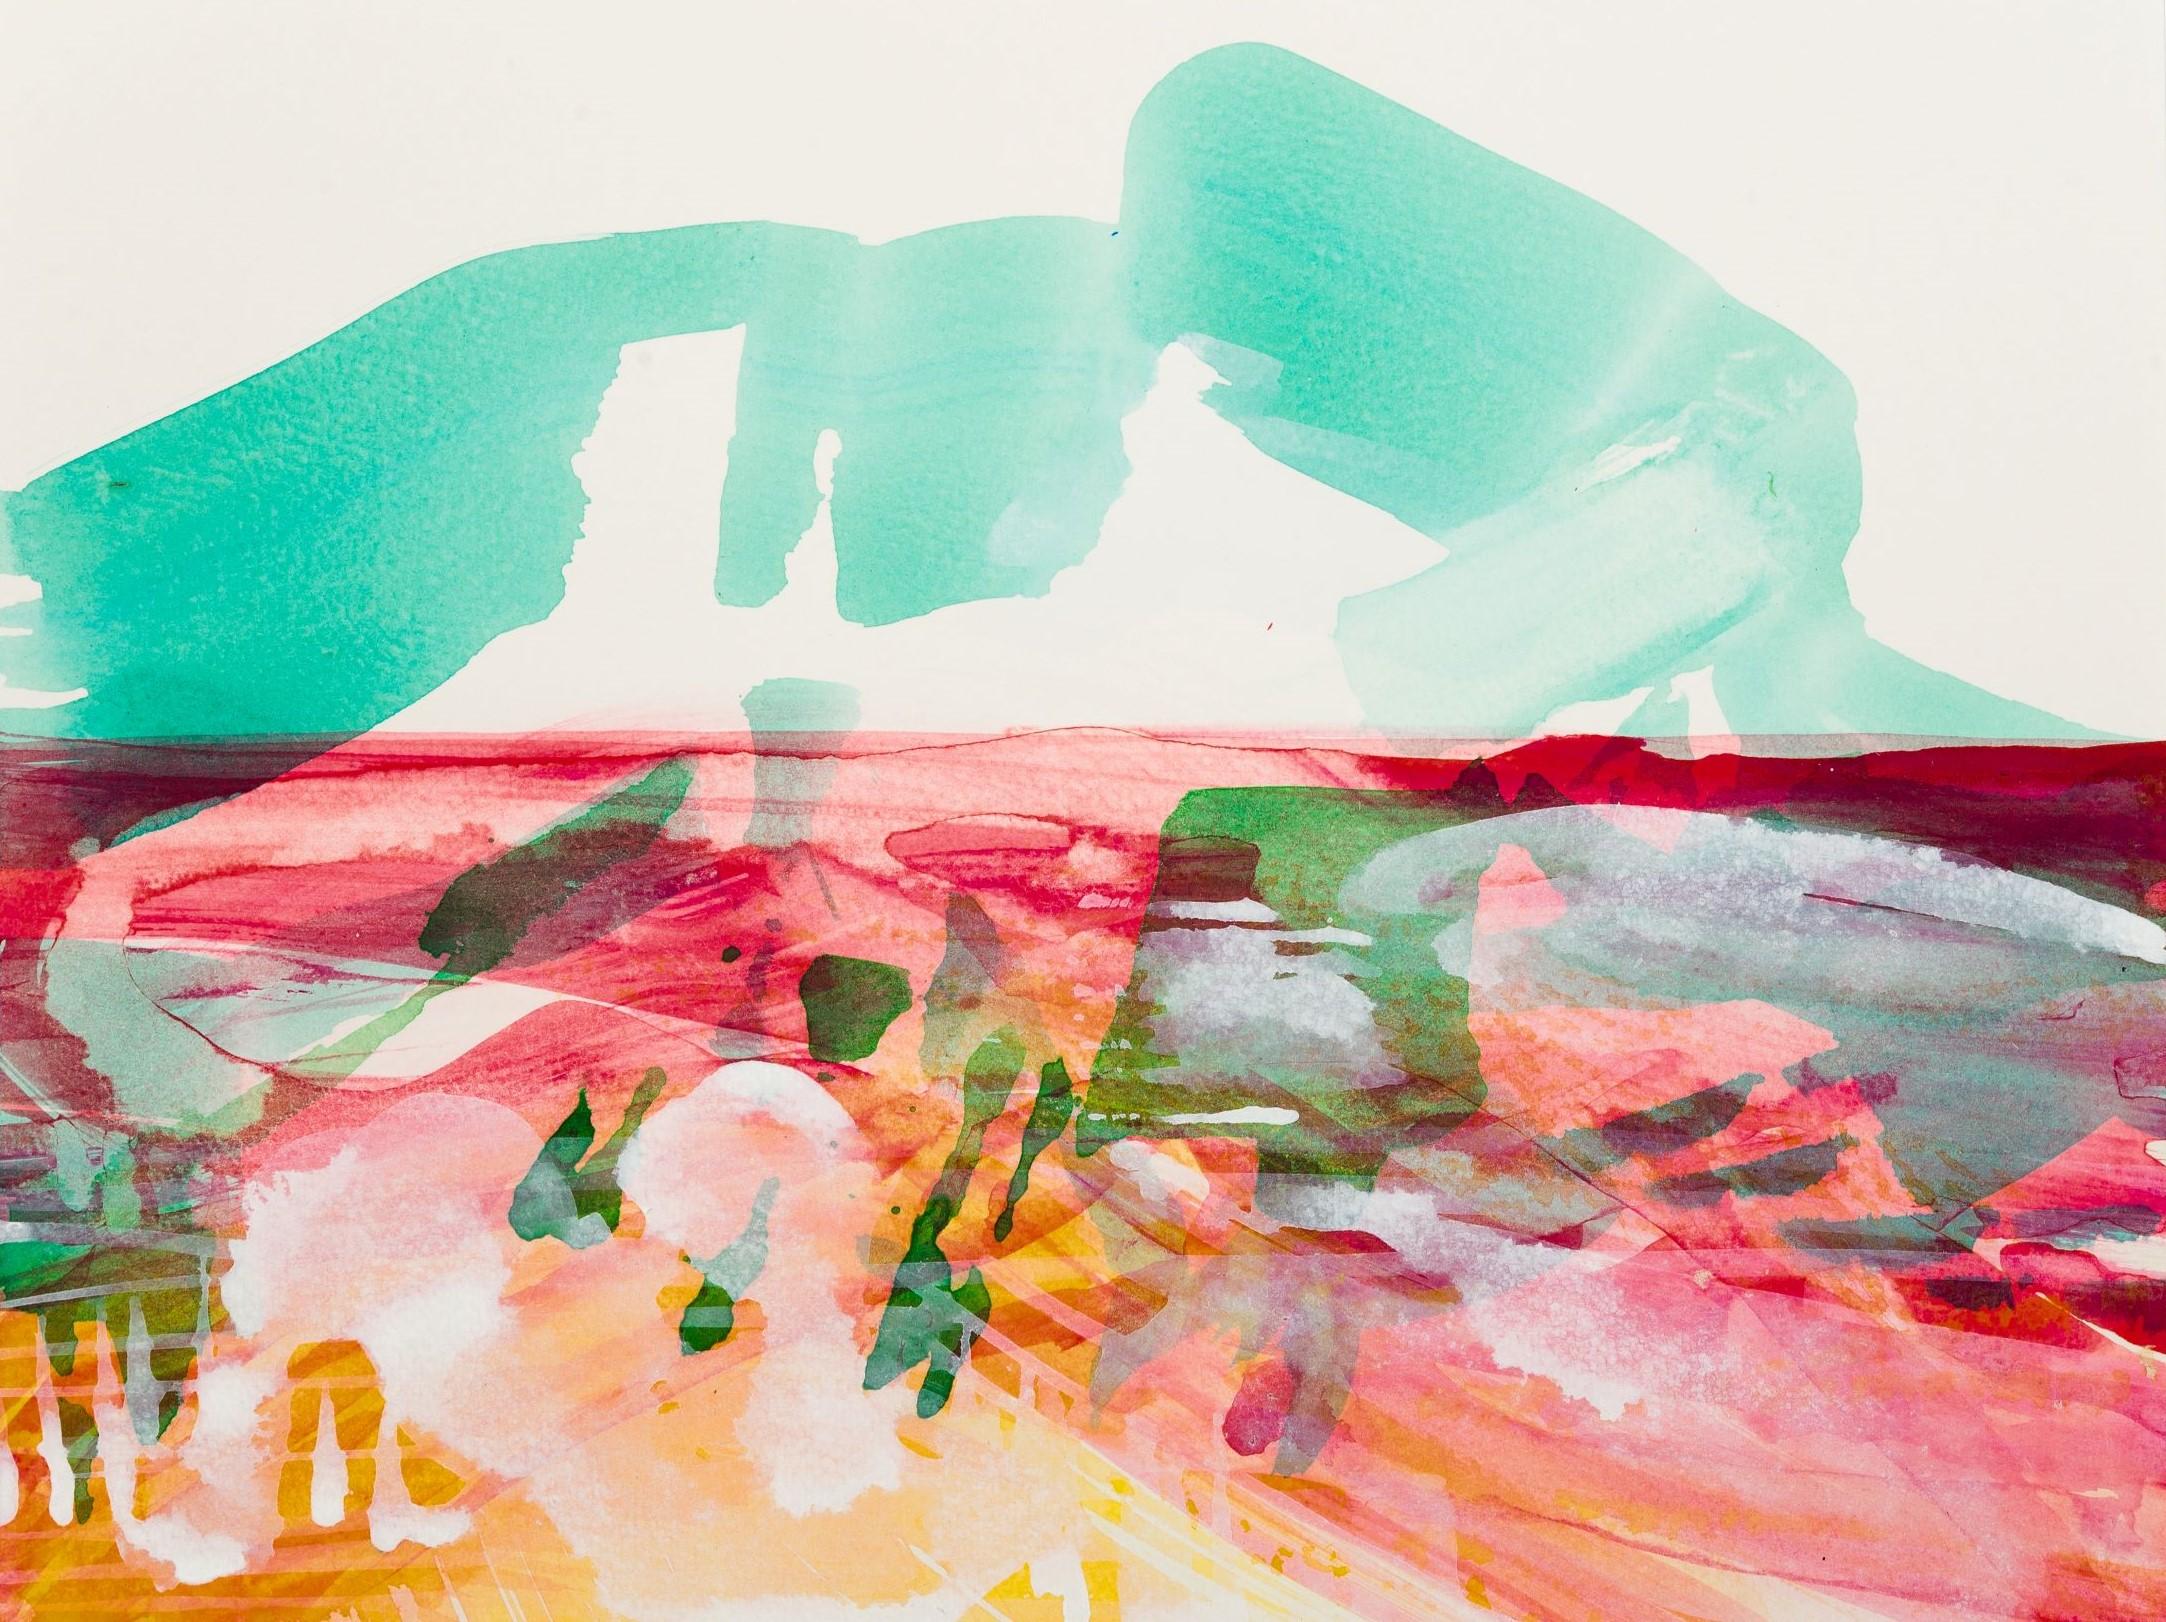 o.T., 2015, Acryl auf Papier, 30 x 40 cm, © Uta Weil, VG Bild-Kunst, Bonn